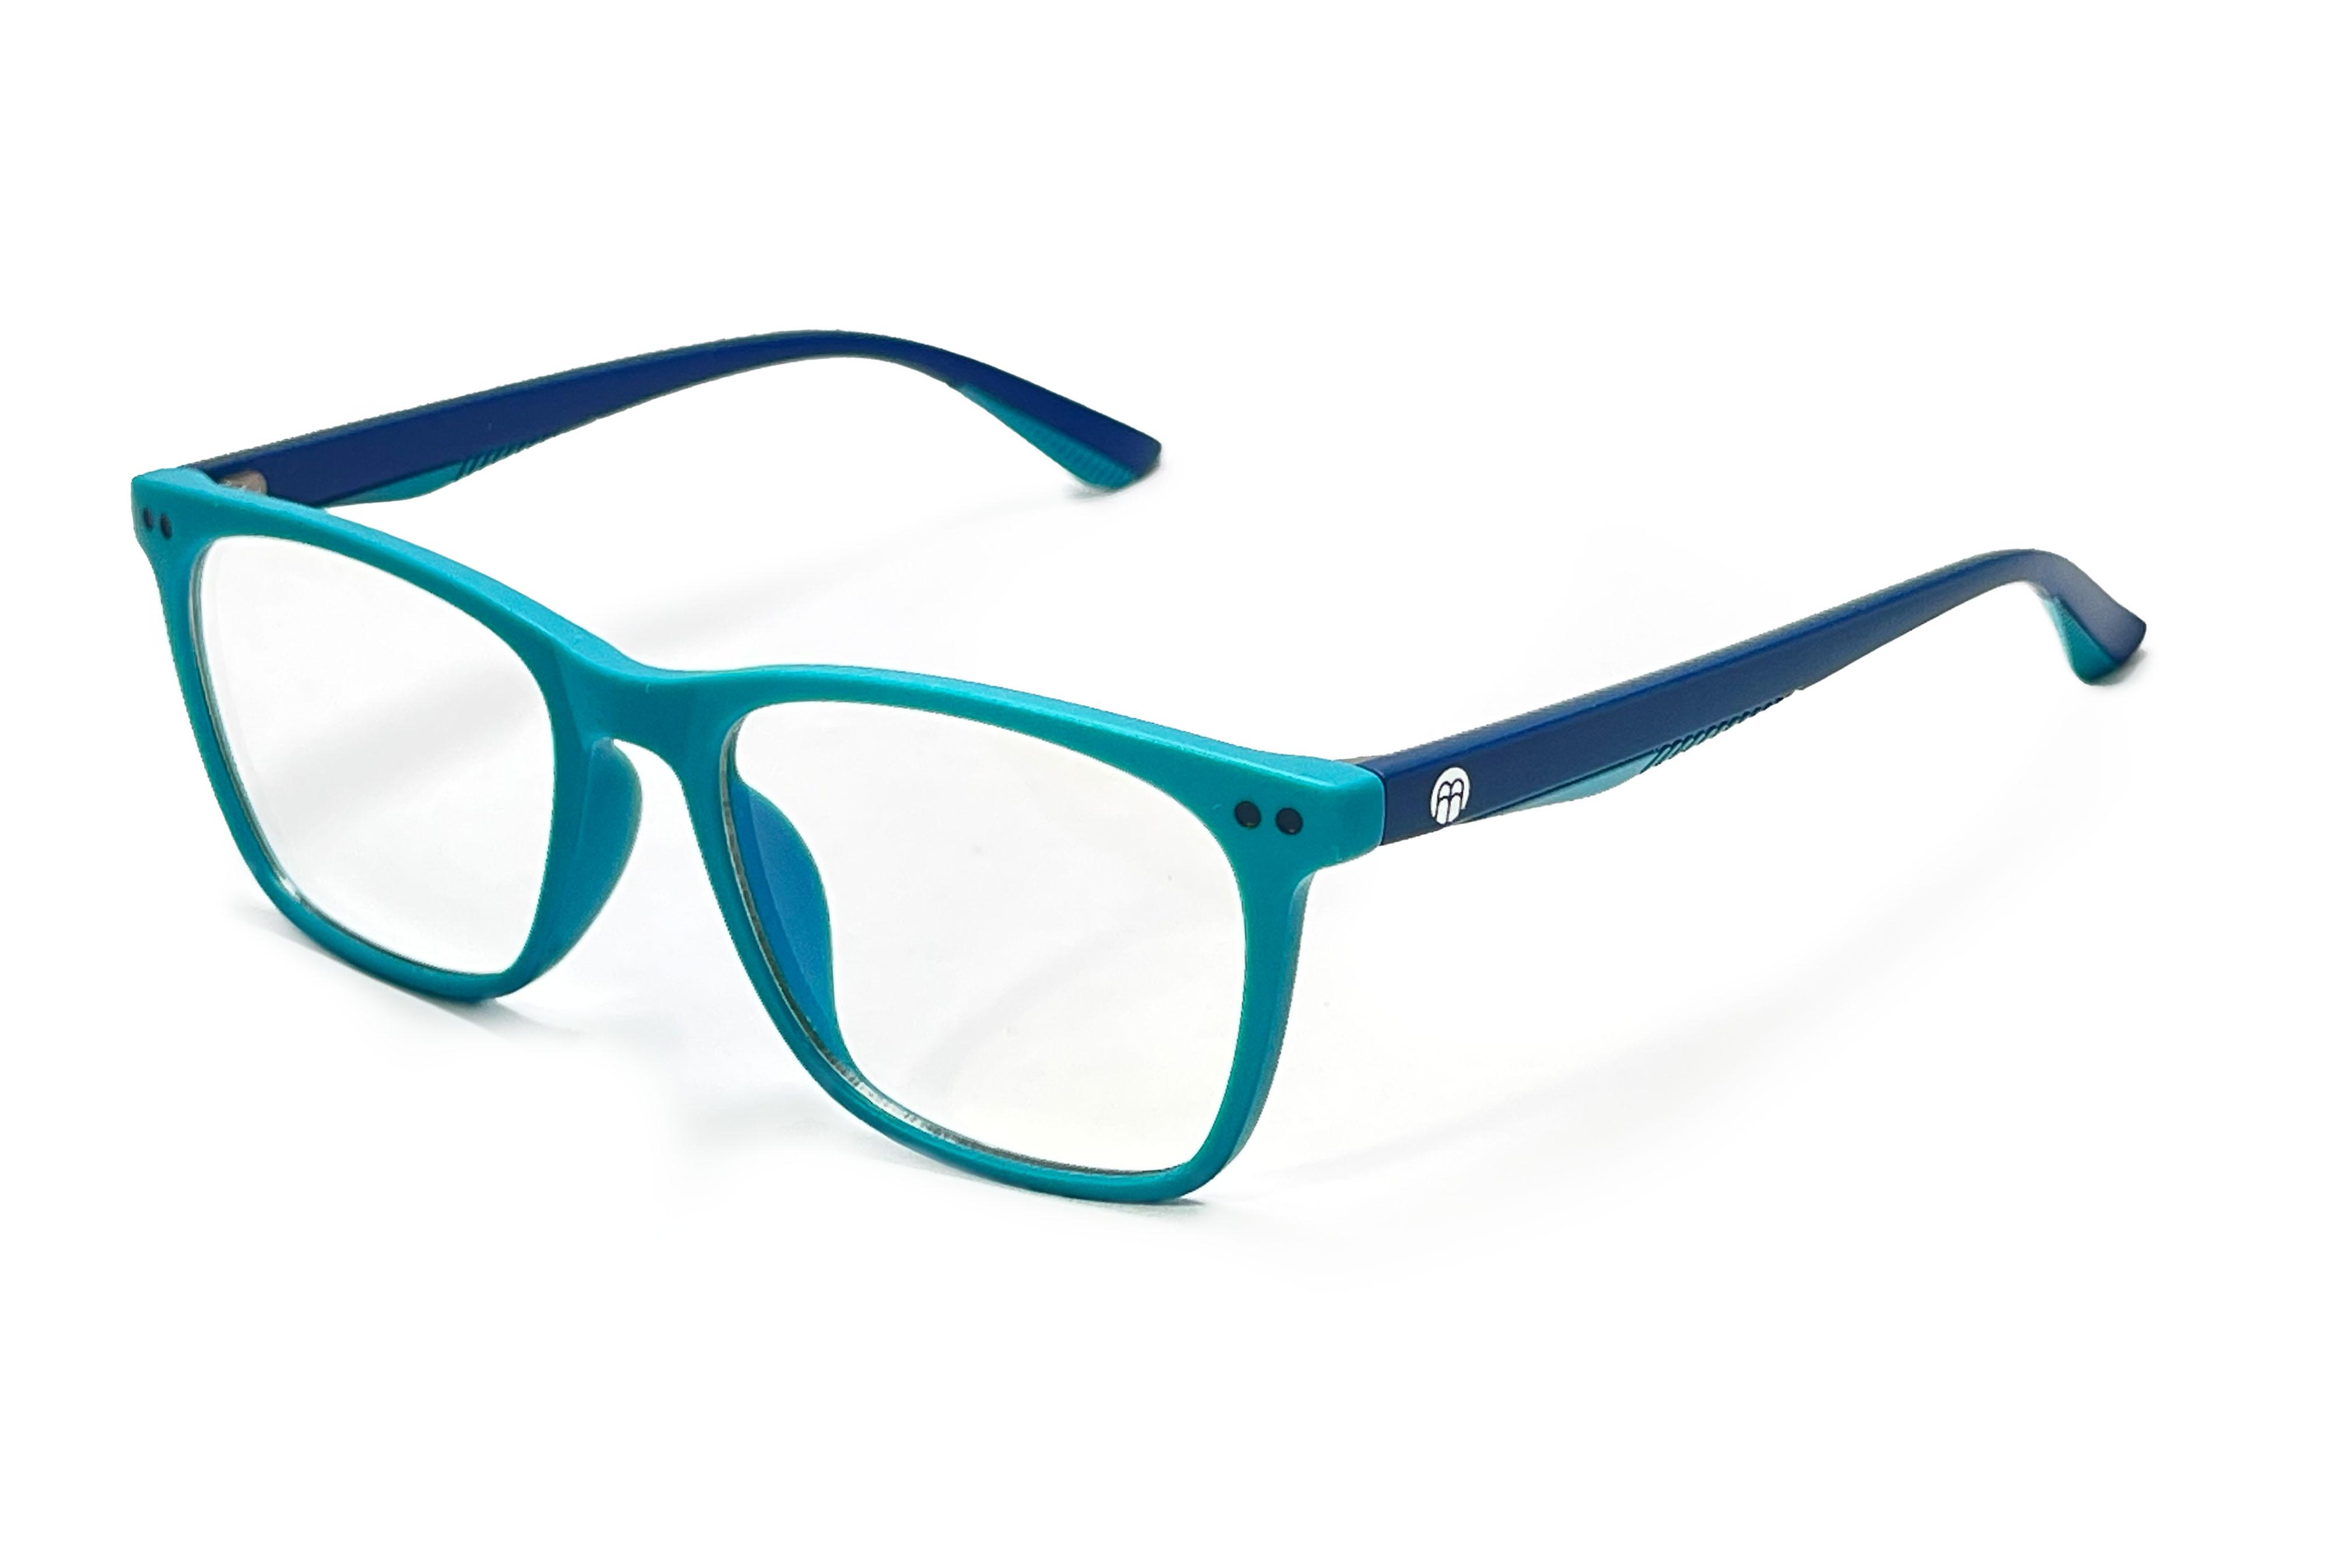 BrainMax Detské okuliare blokujúce 15% modrého svetla (zeleno - modré)